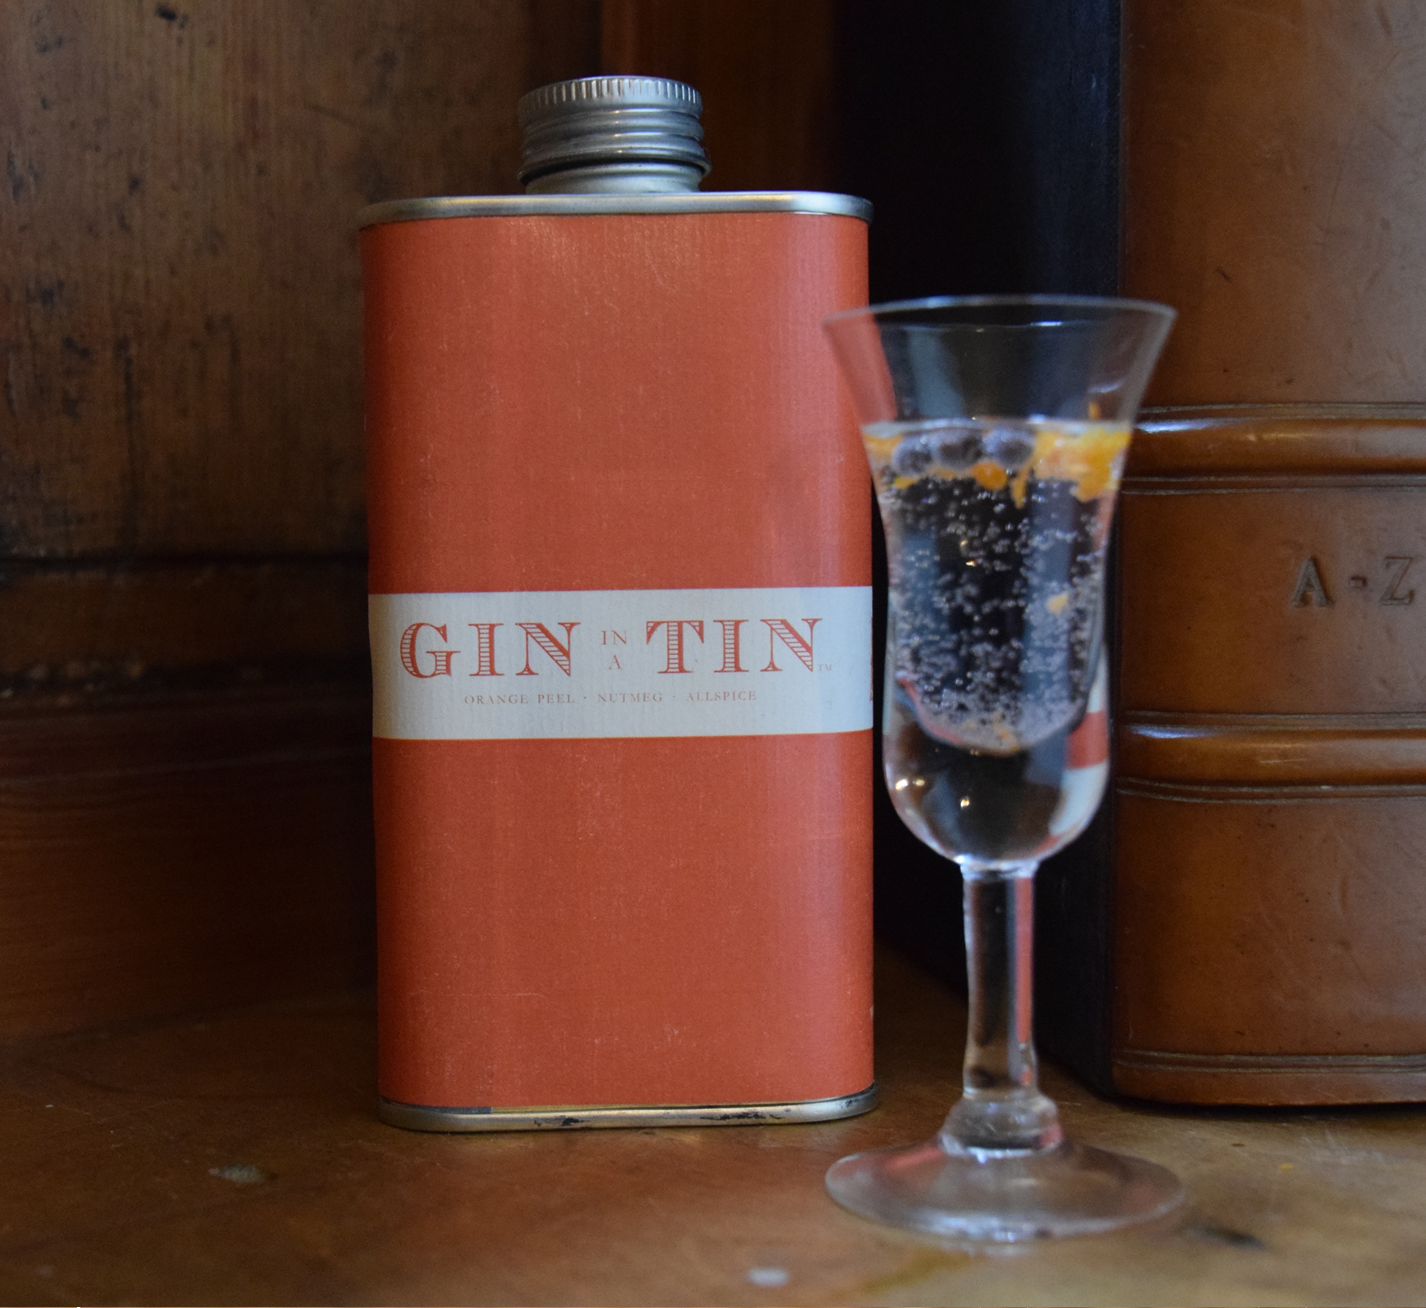 GIN IN A TIN - ORANGE PEEL, NUTMEG & ALLSPICE – WINTER NO.1